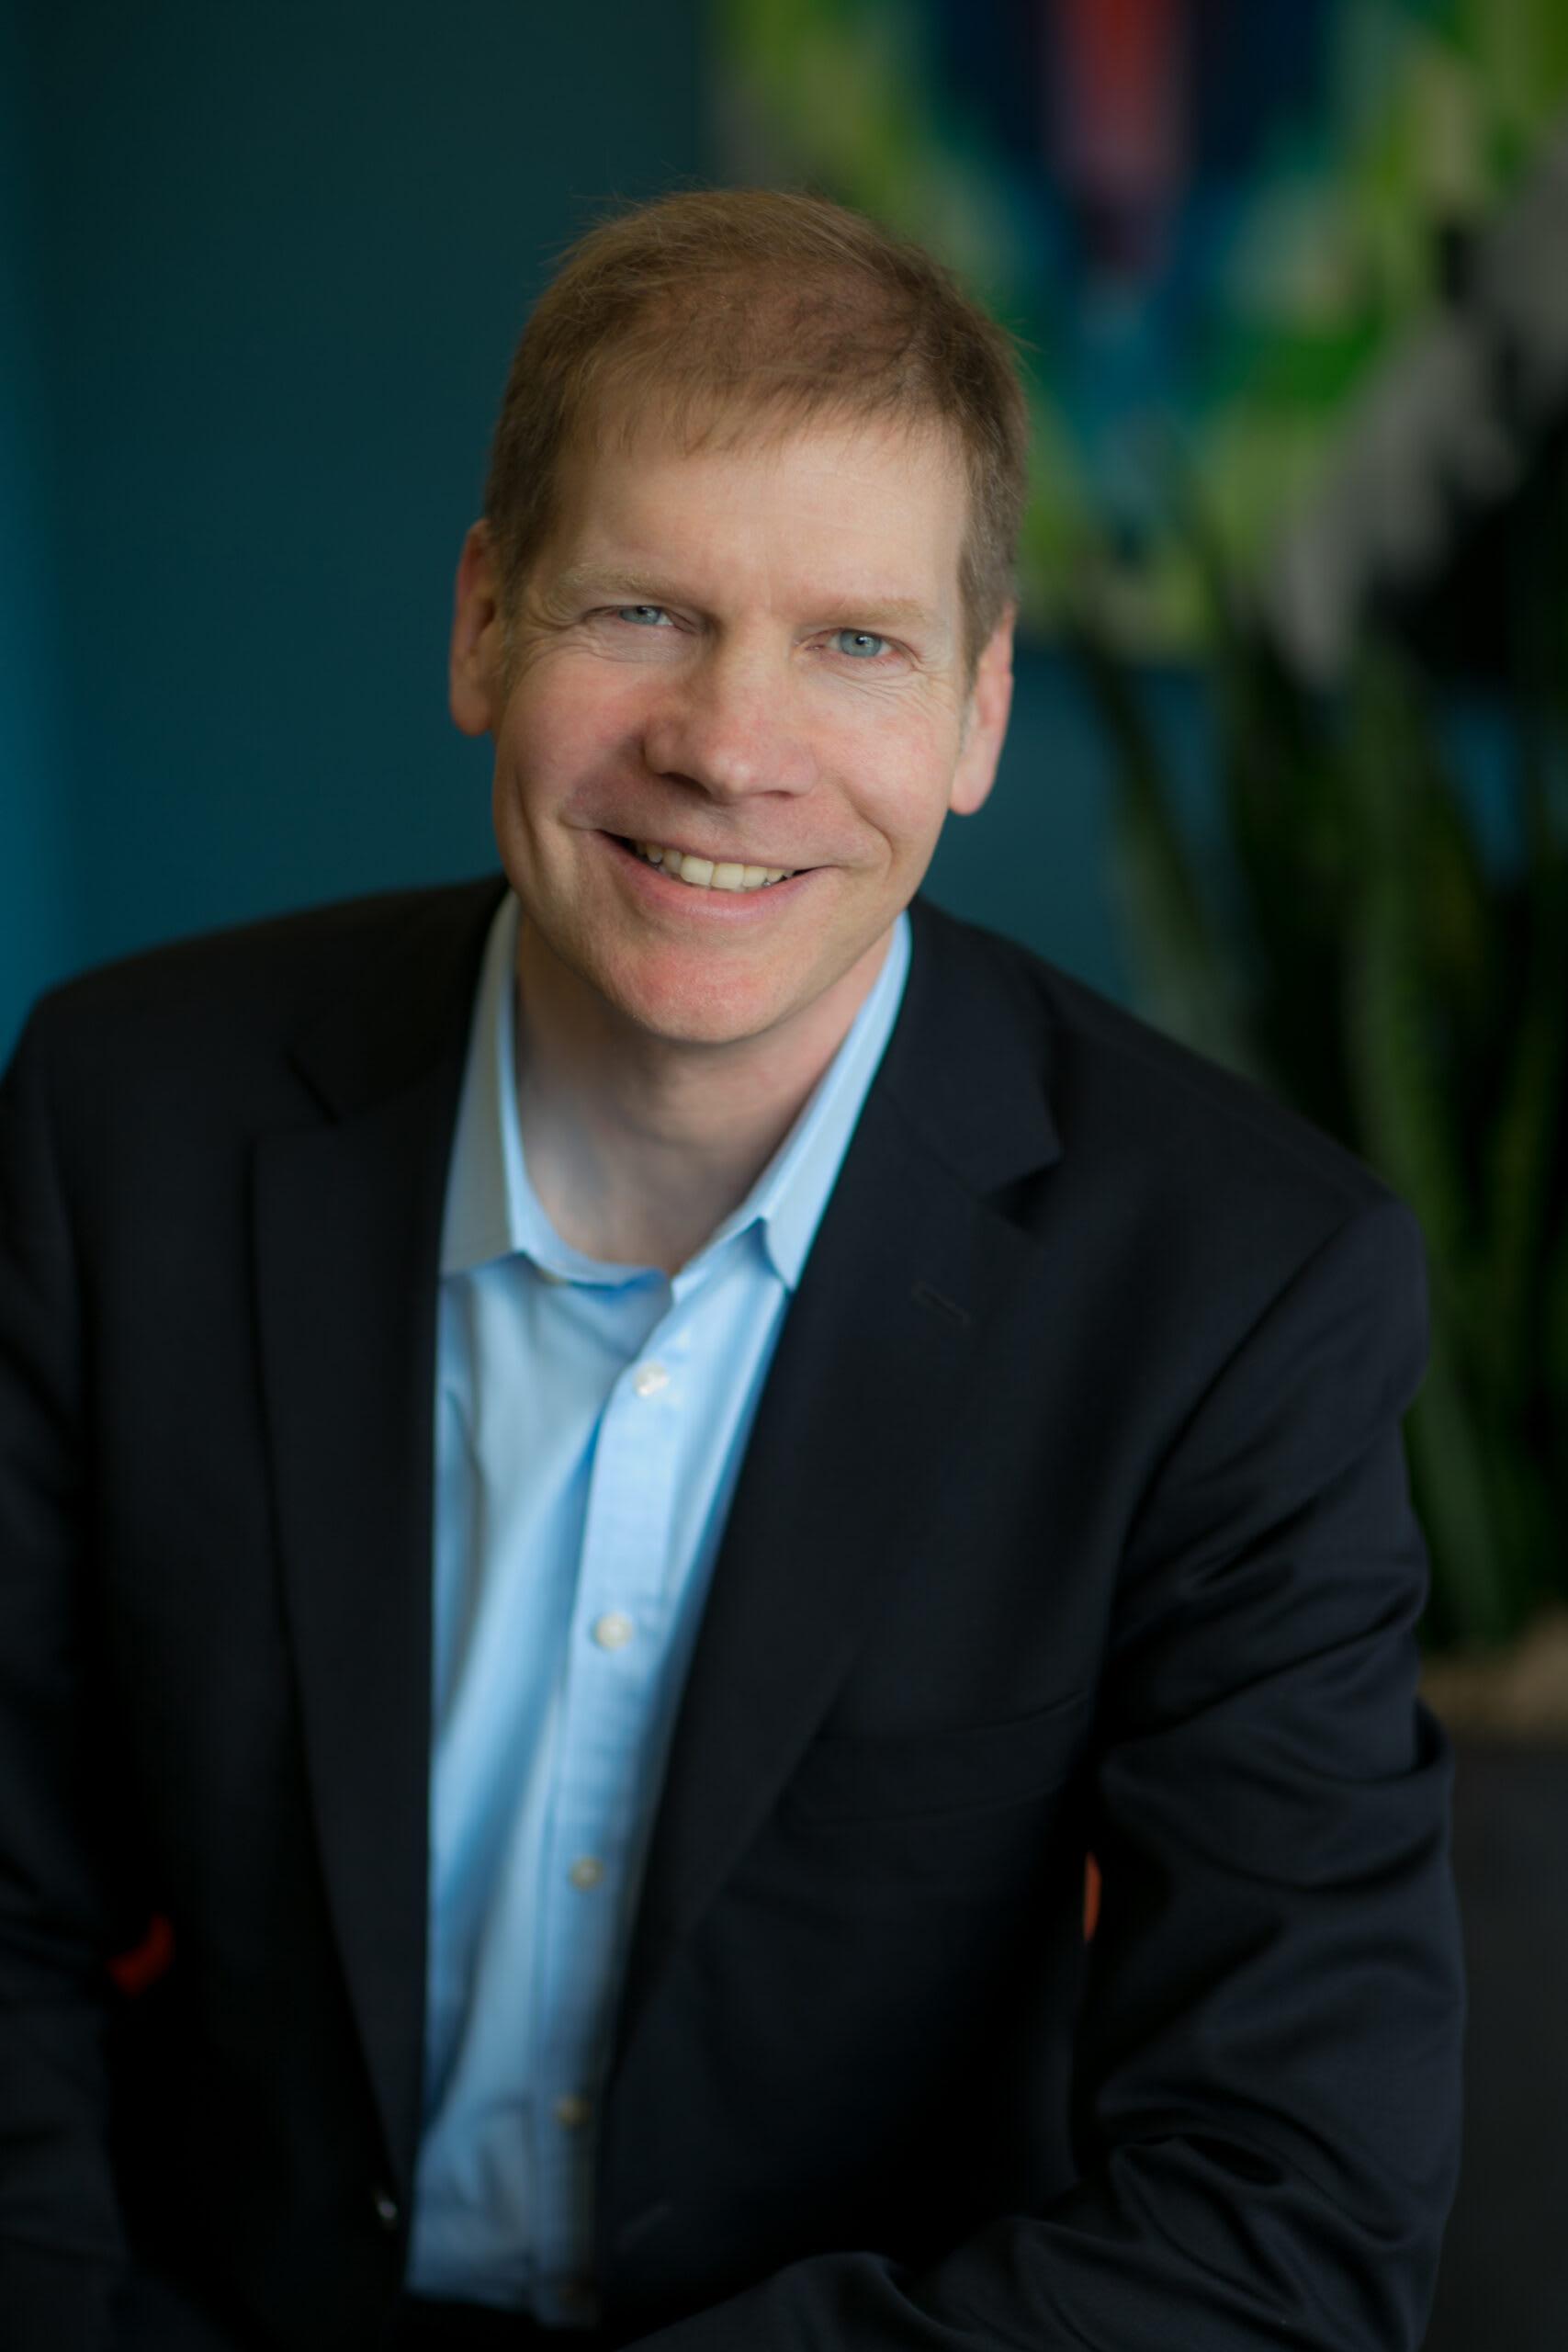 Interview With Jim Howard, CEO of CrownPeak